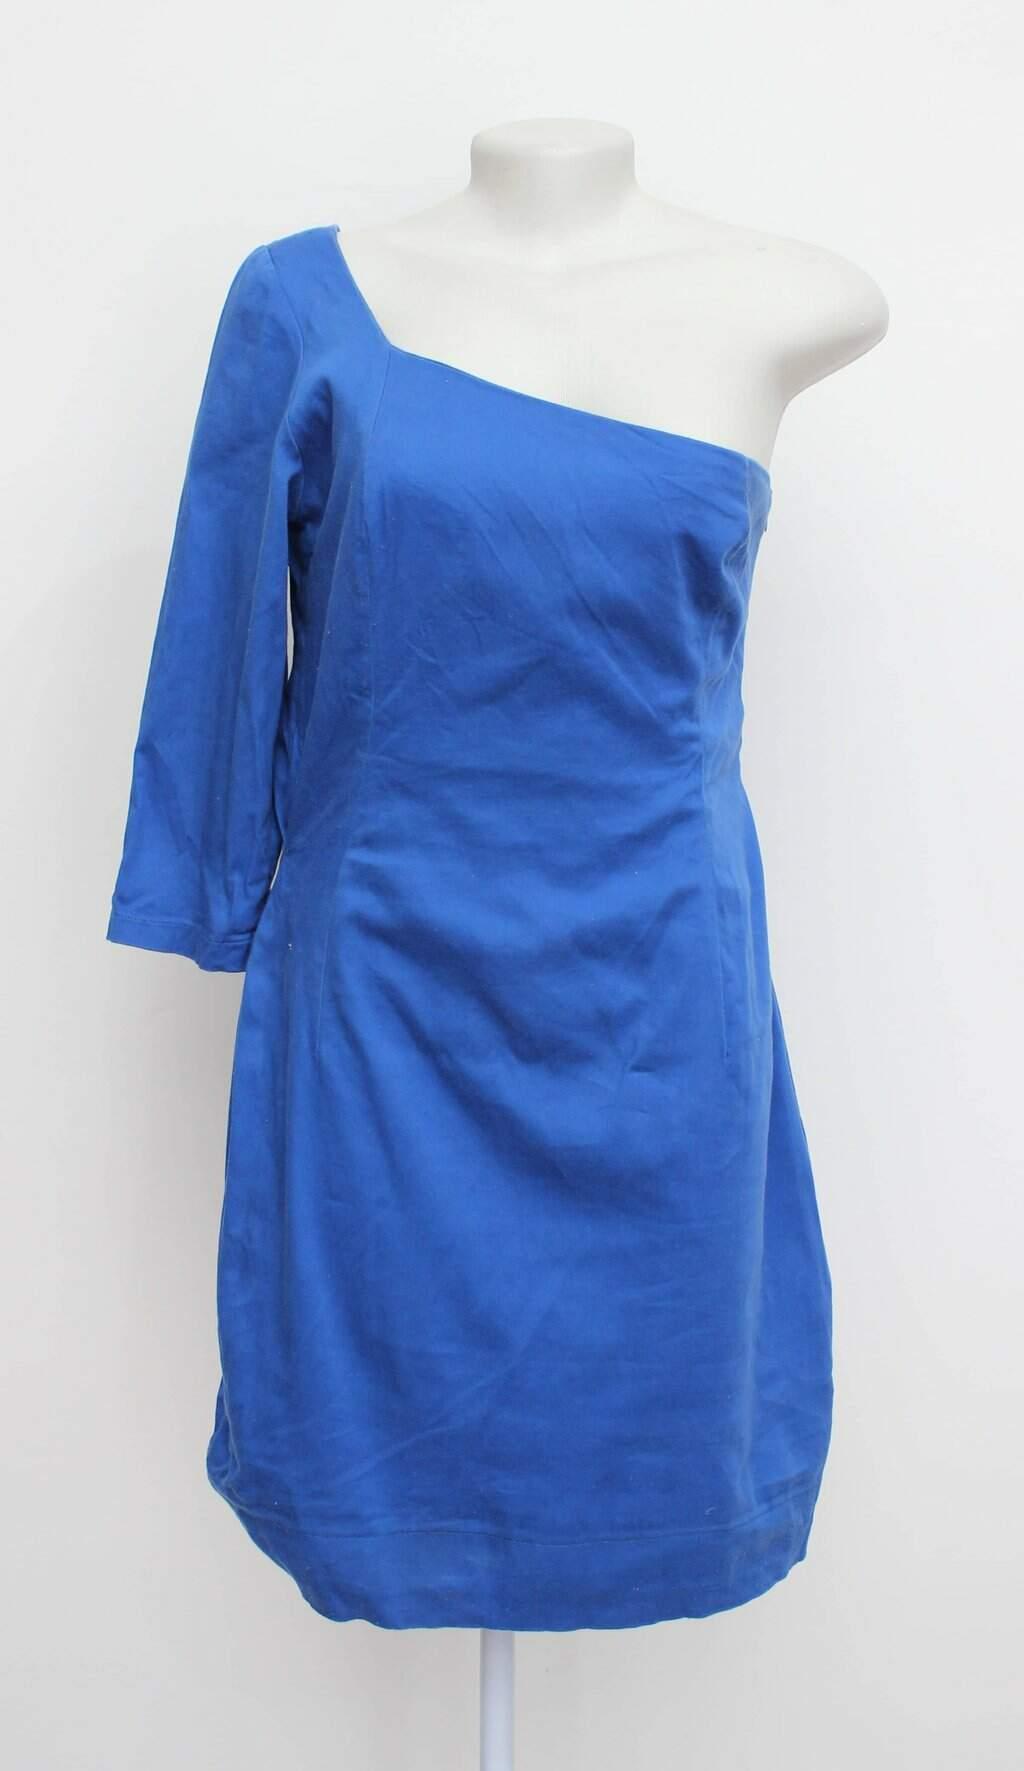 Vestido ombro unico azul